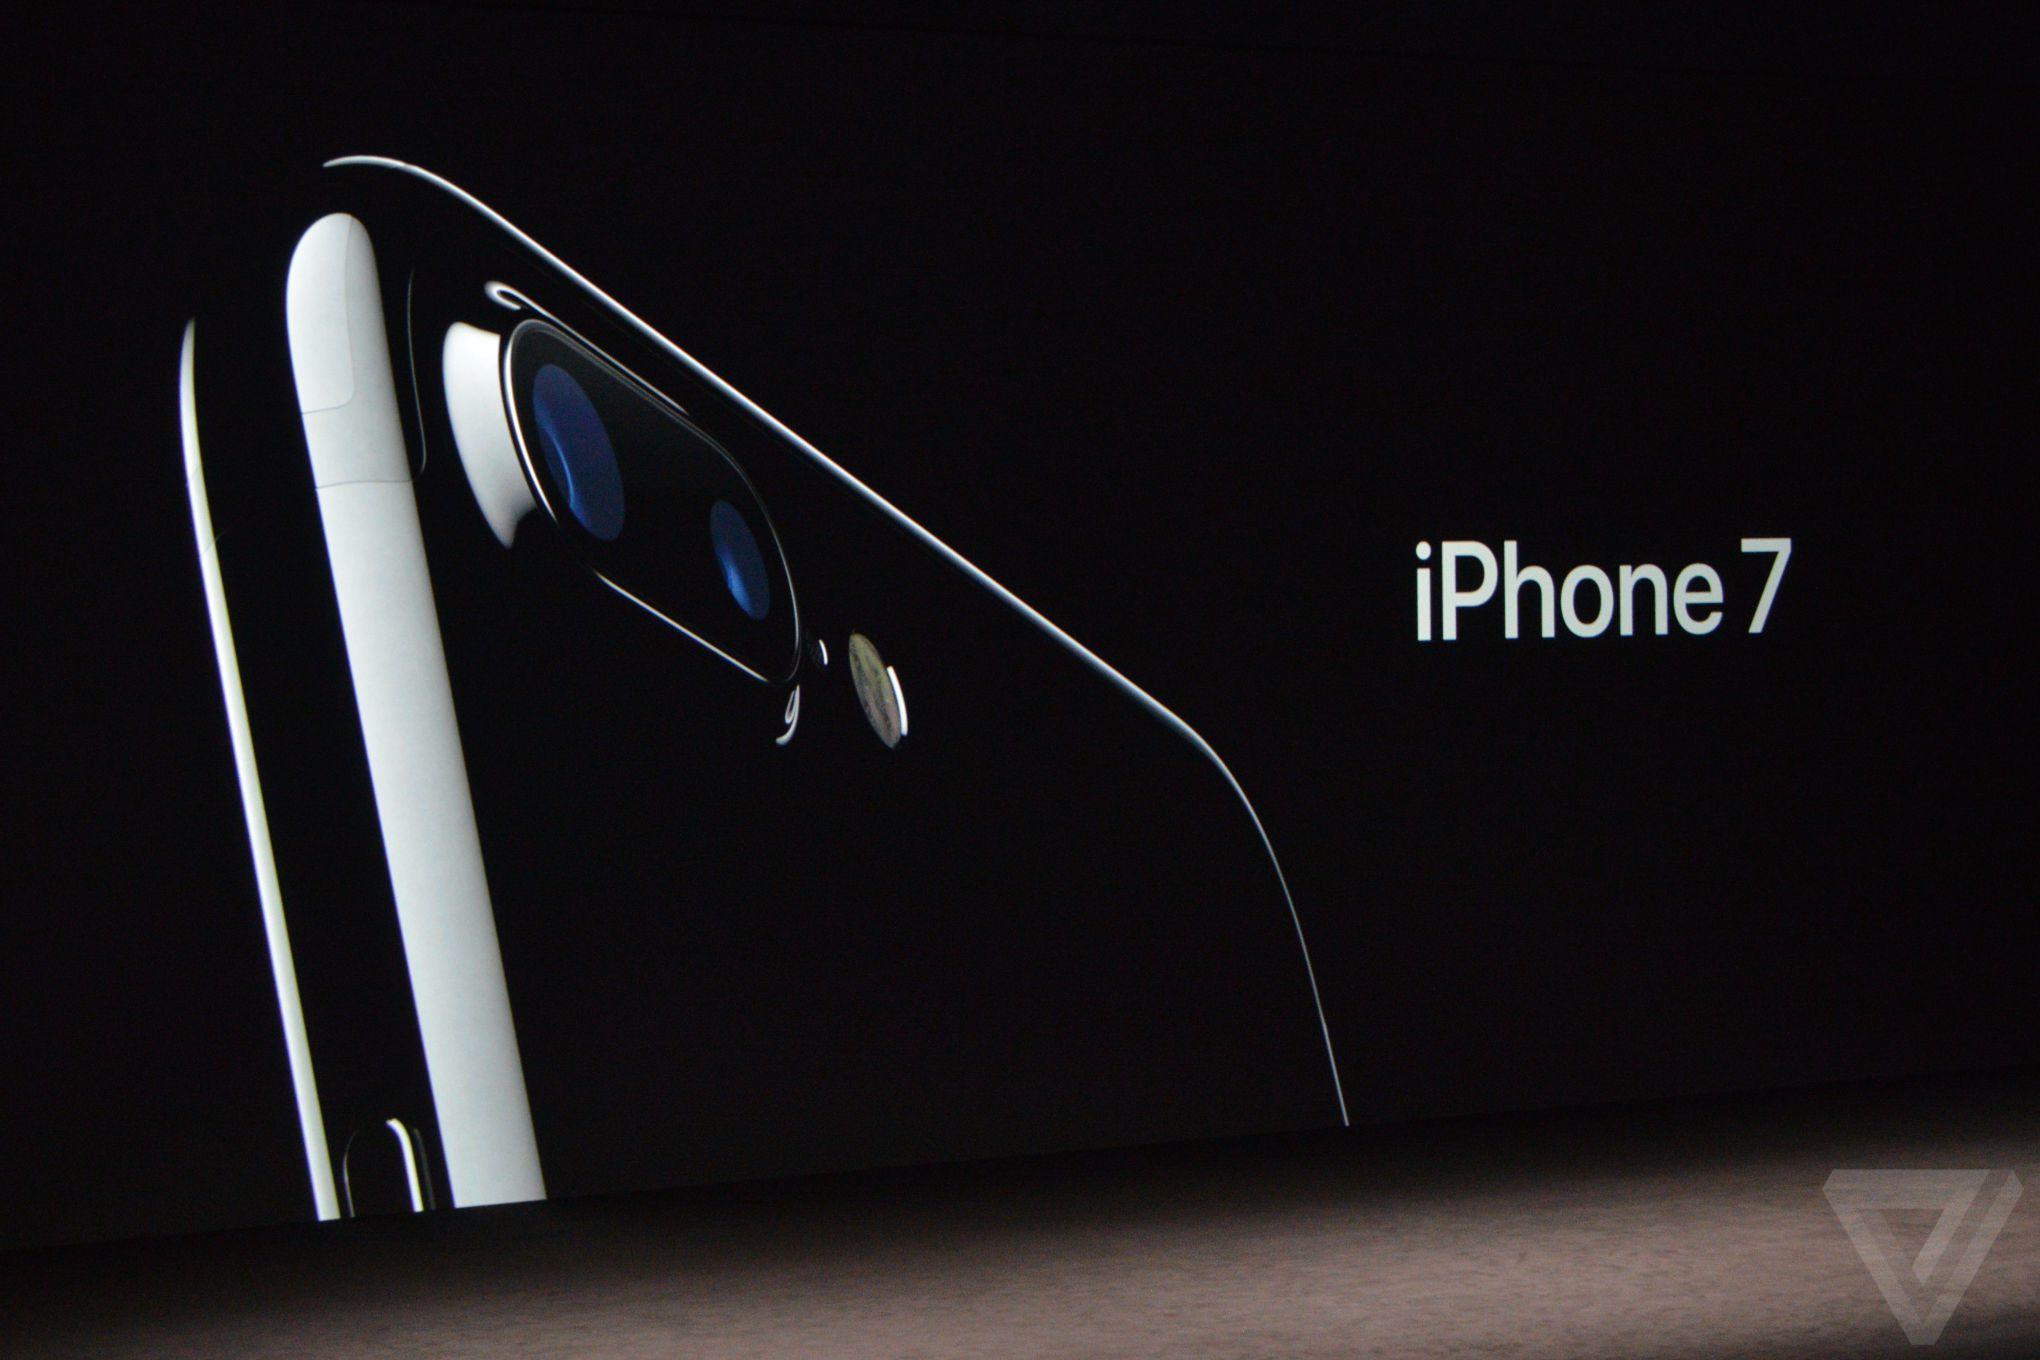 iPhone 7 watch